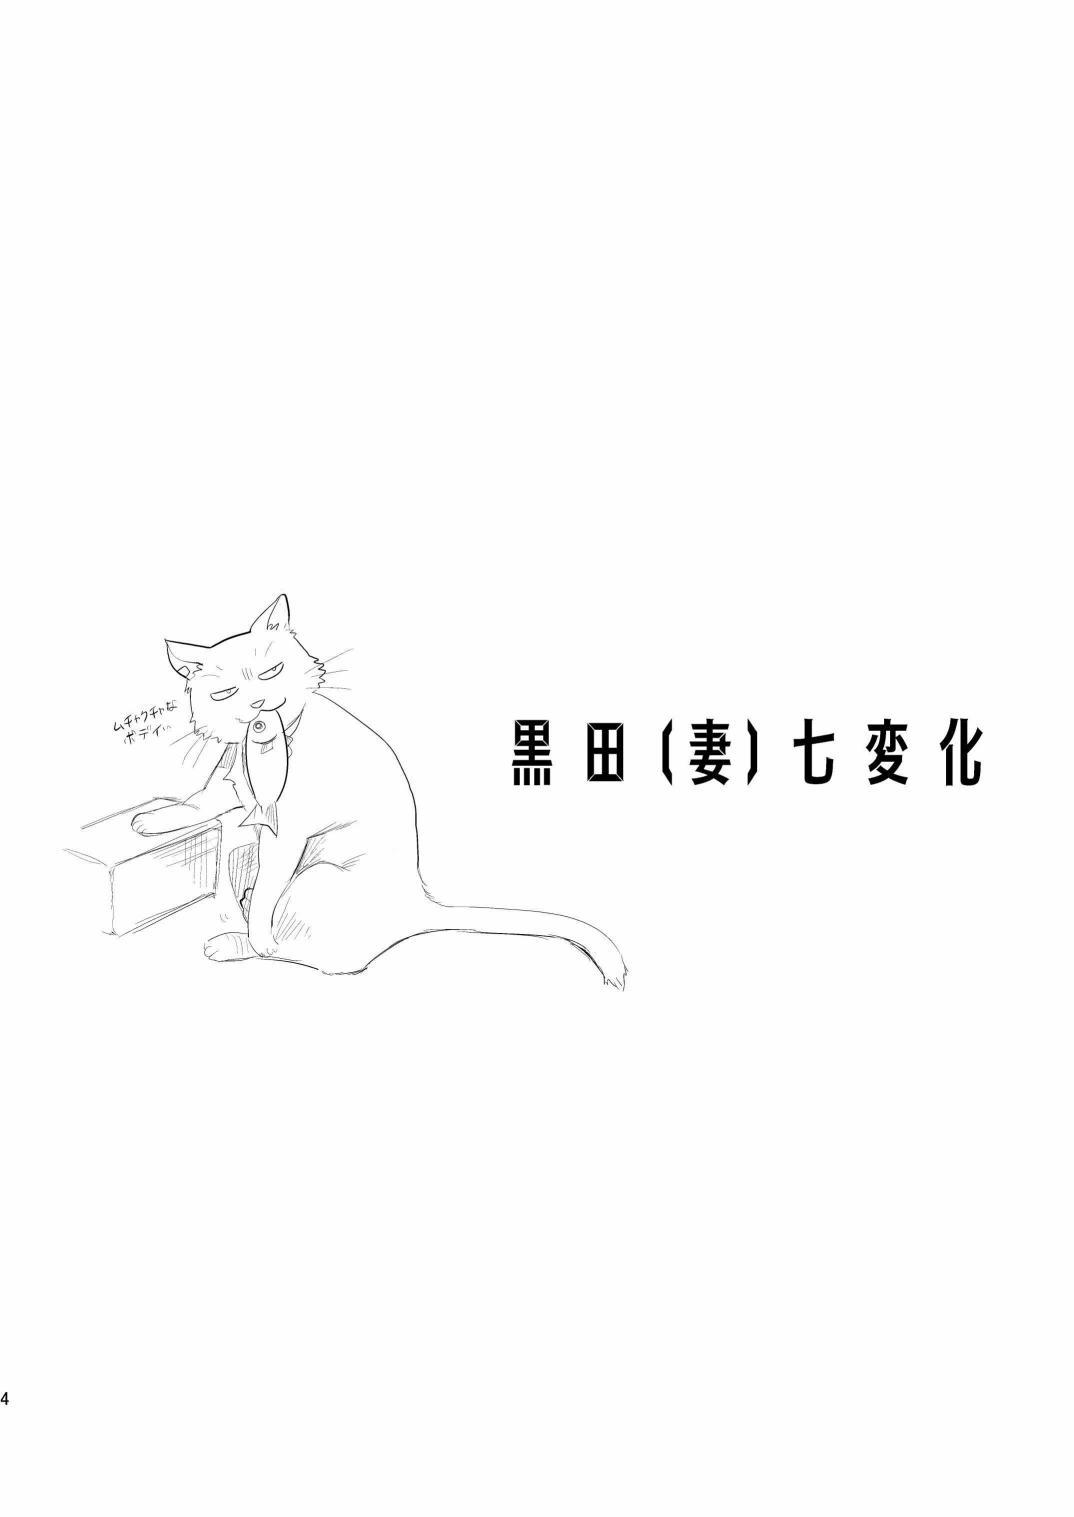 (COMIC1☆4) [AHM (Inu-Blade, Lact Mangan)] Kuroda (Tsuma) Shichihenge (DARKER THAN BLACK) 2